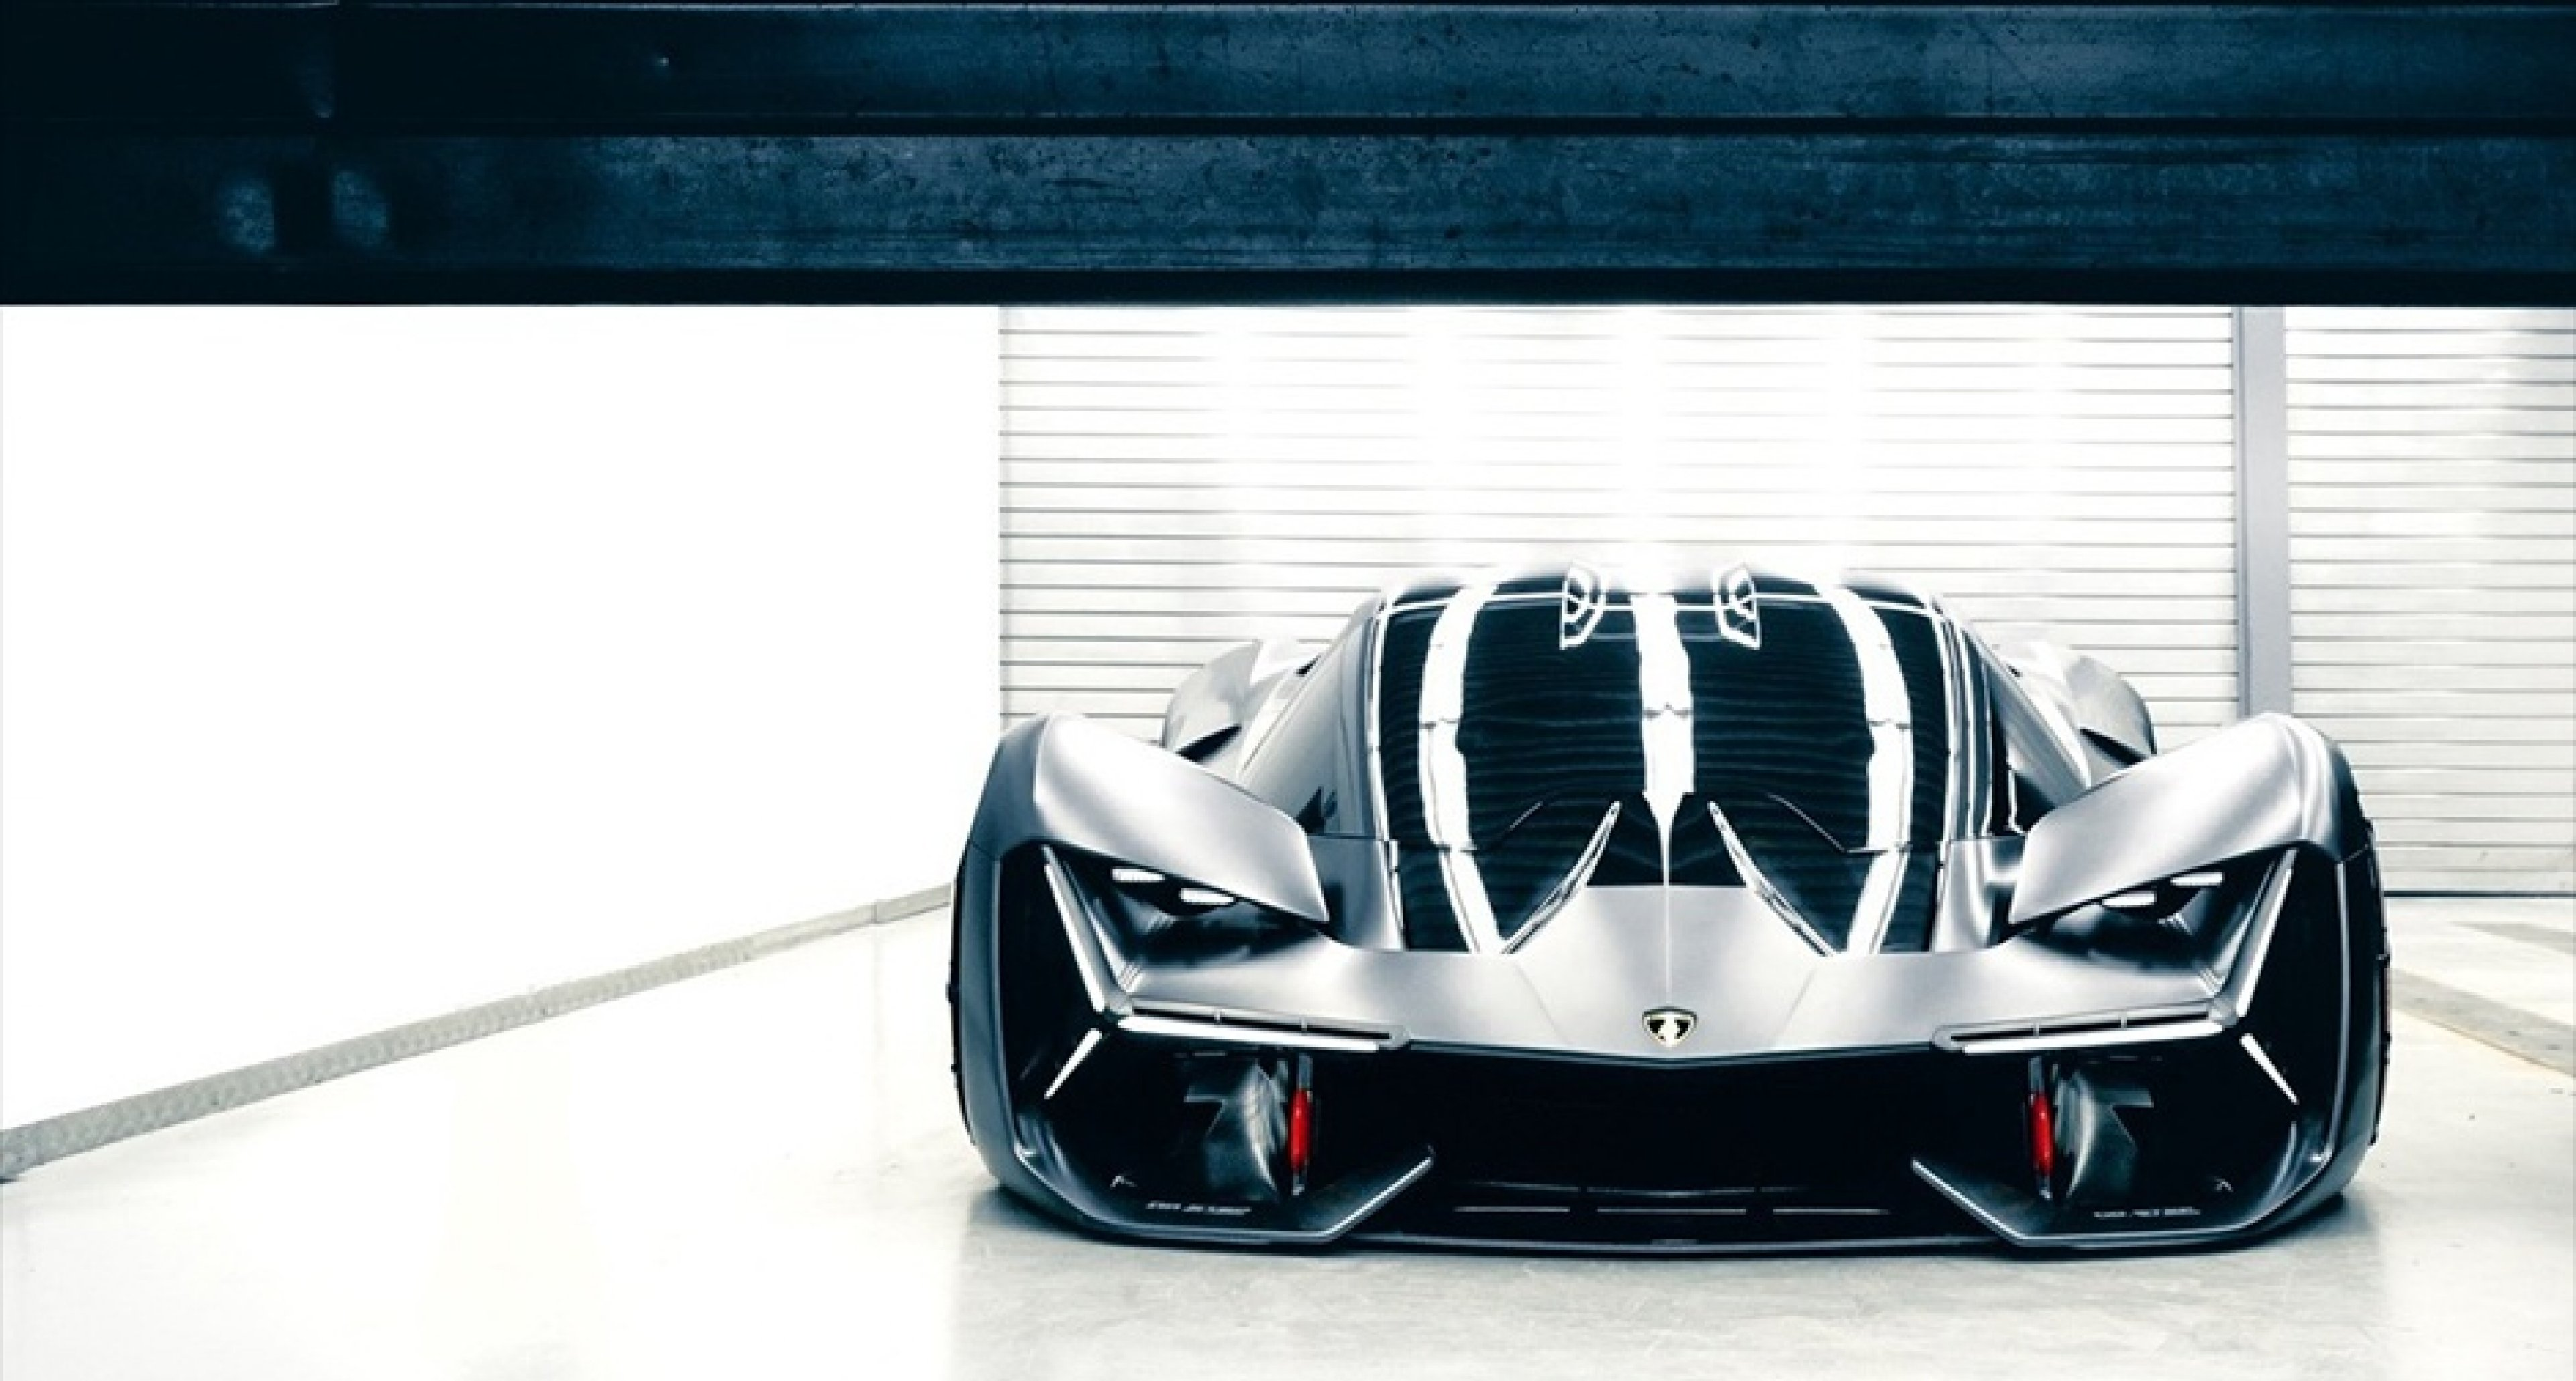 Lamborghini S Terzo Millennio Is A Tantalising Taste Of The Future Of The Supercar Classic